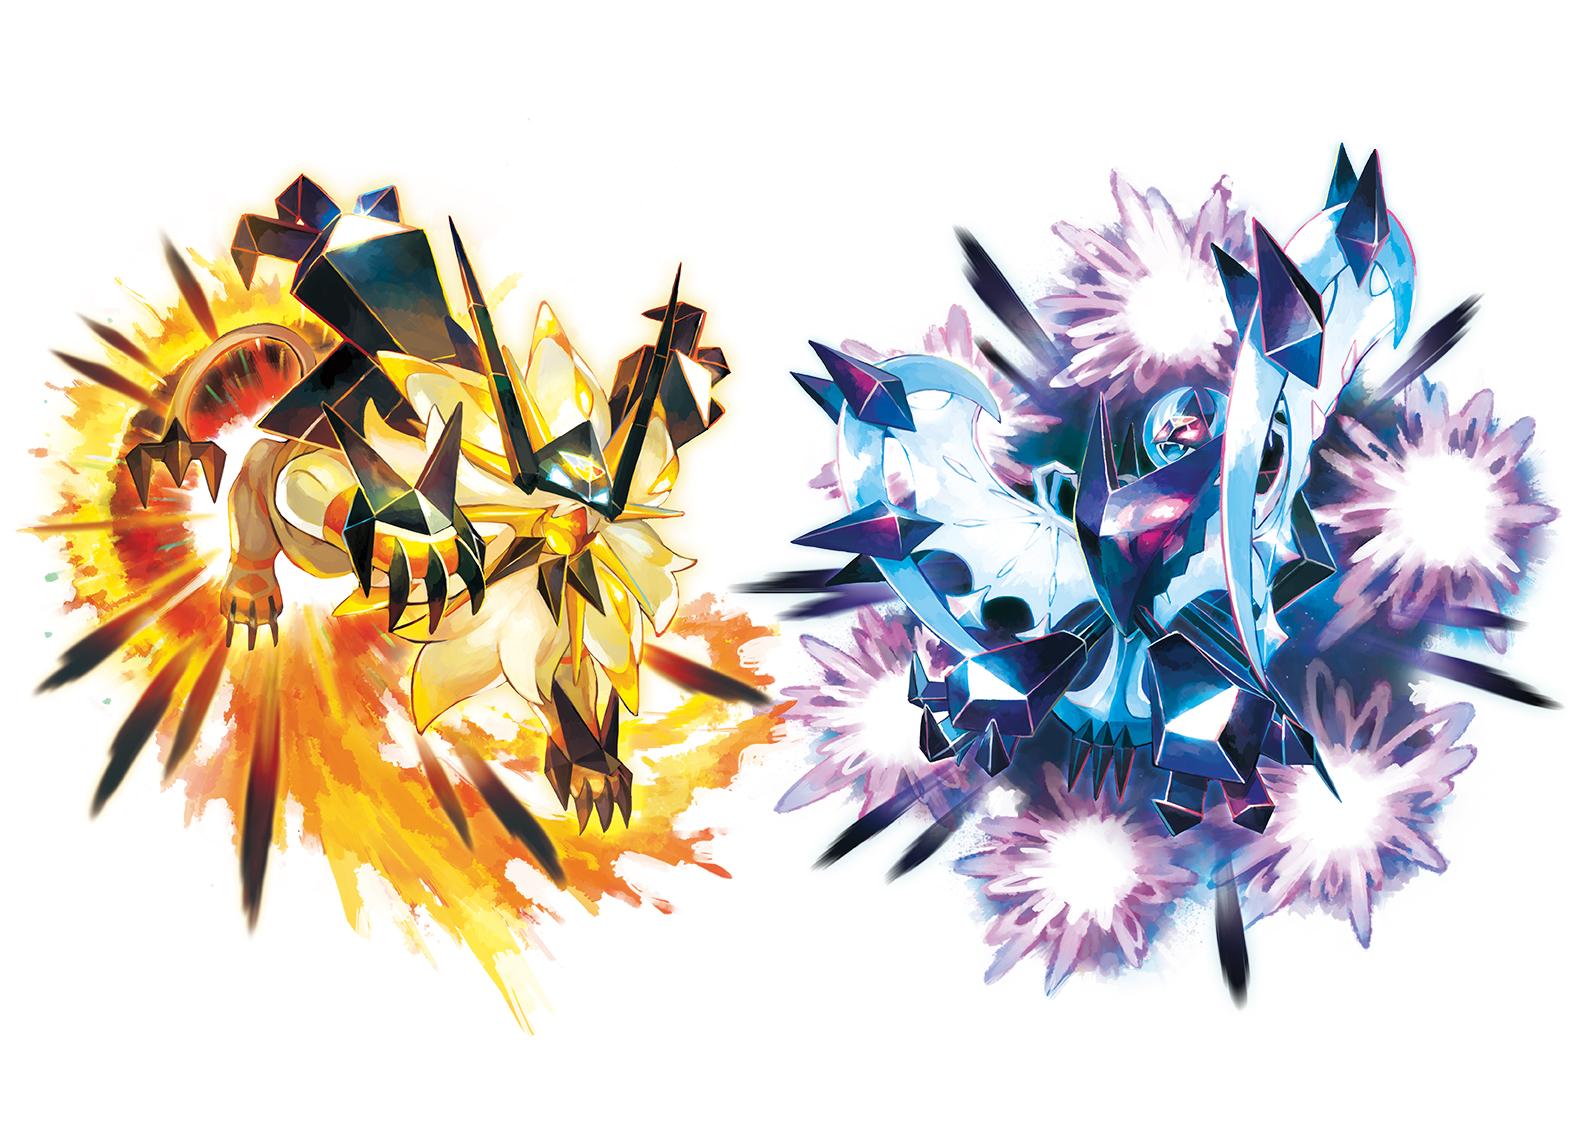 Pokemon Ultra Sun Ultra Moon Details Necrozma Z Moves New Rotom Dex Features Nintendo